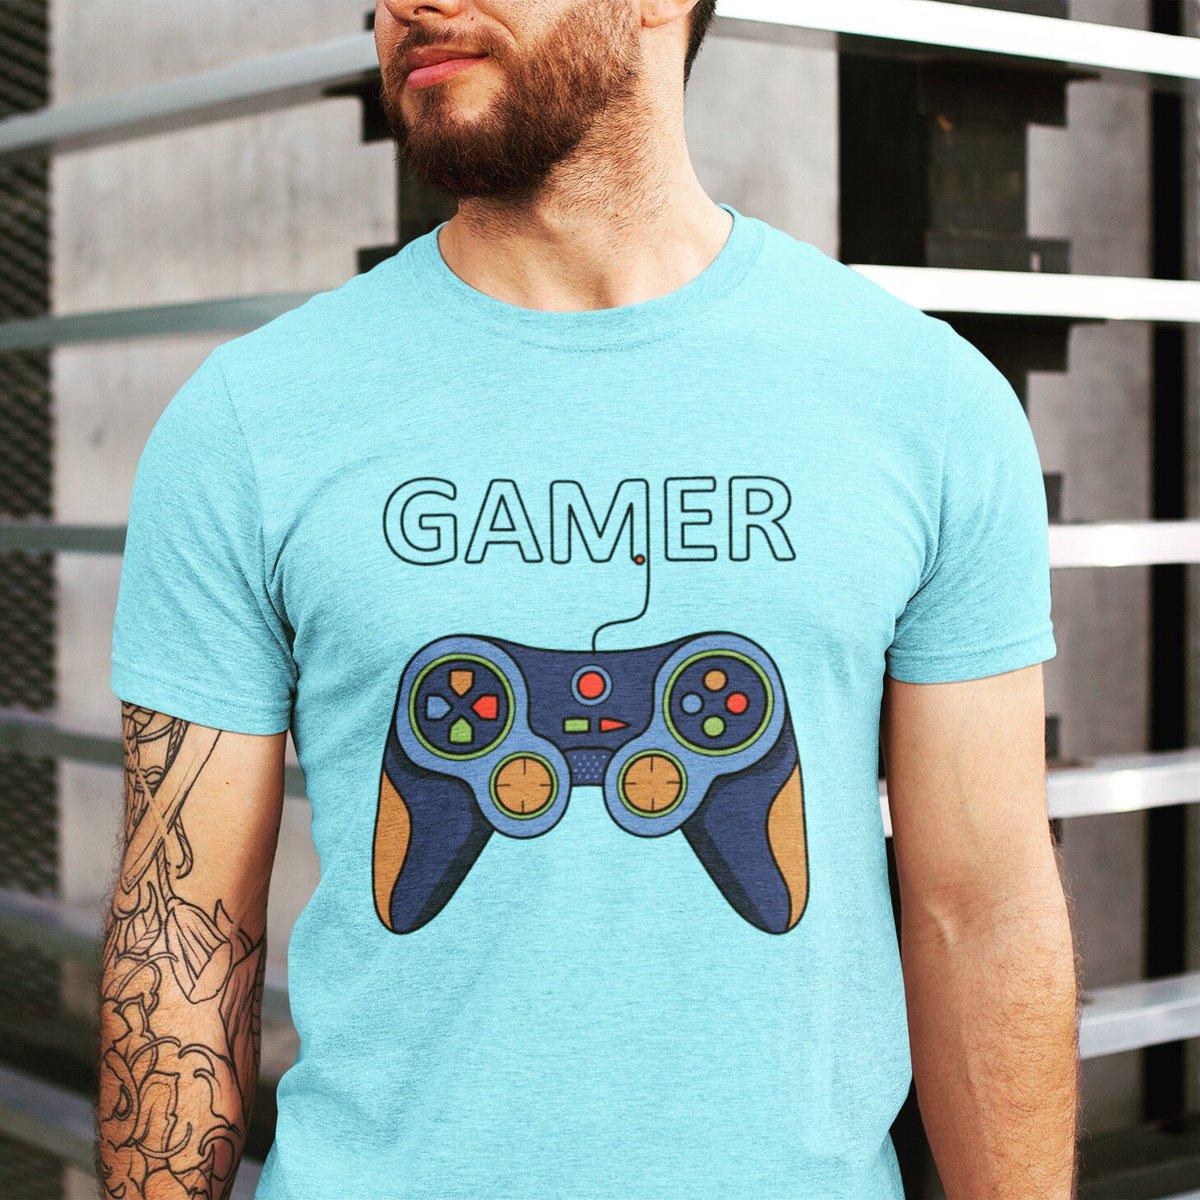 Coming through with this solid gamer design to celebrate an old love! #gaming   Love this tshirt? Shop link in bio.   #gamer #GamersUnite #retrogamer #geek #consolegamer #playstation #videogamer #gamergirls #ps #gamerguy #art #tshirt #gamingcommunity #thursdaymorning